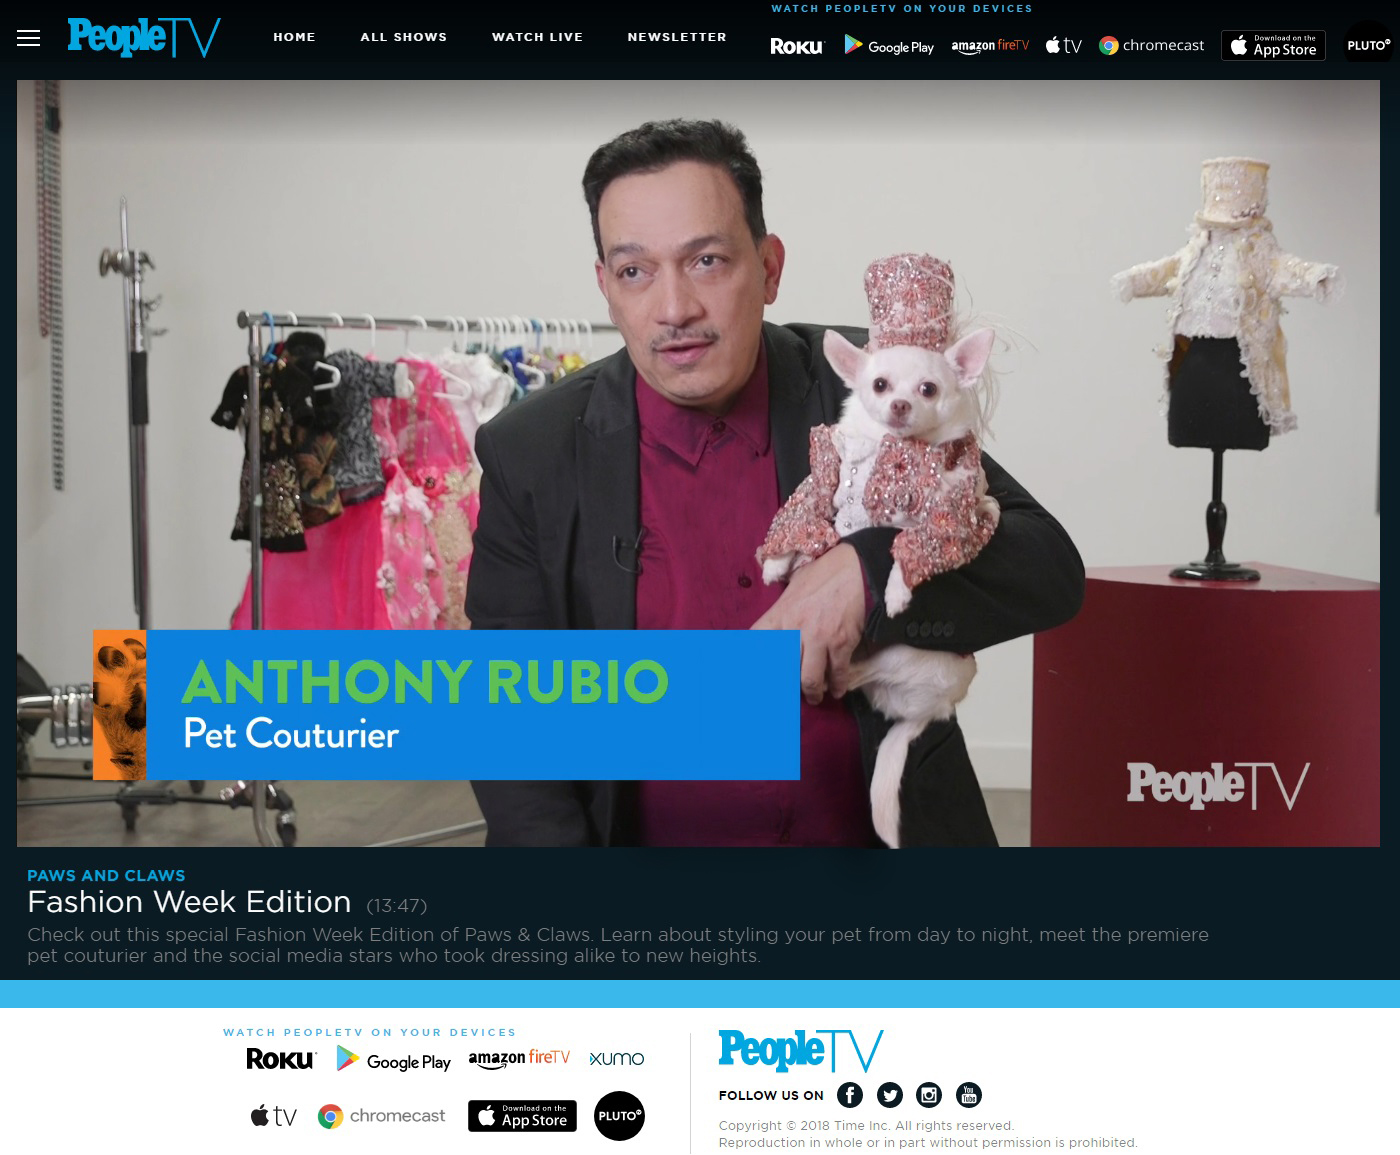 Anthony Rubio Designs In PEOPLE Magazine TV!